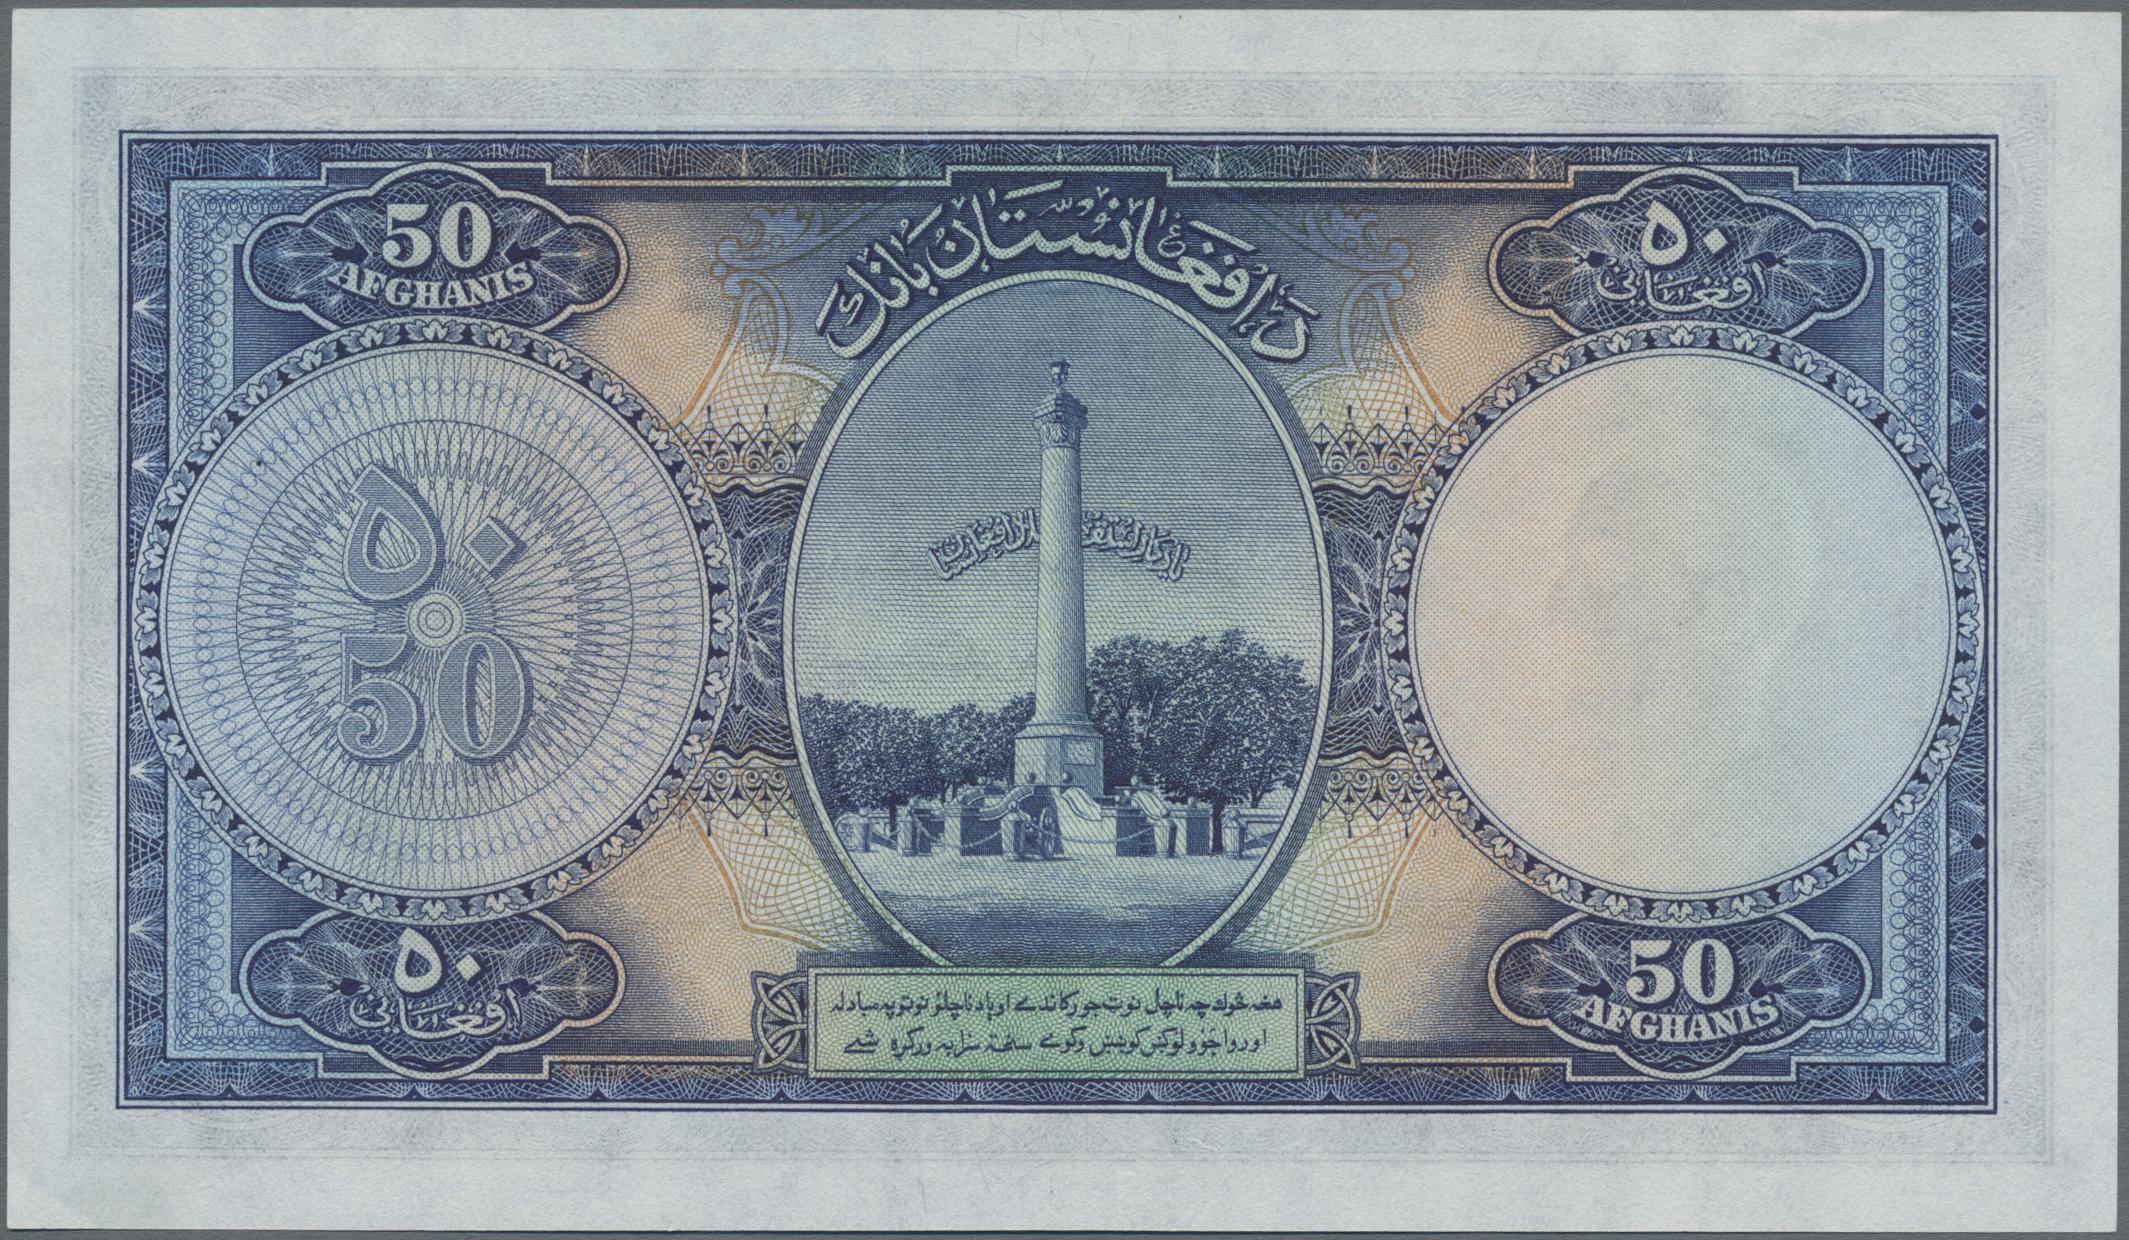 Lot 8001 - Afghanistan banknoten -  Auktionshaus Christoph Gärtner GmbH & Co. KG Sale #47 Banknotes Worldwide & Germany, Numismatics